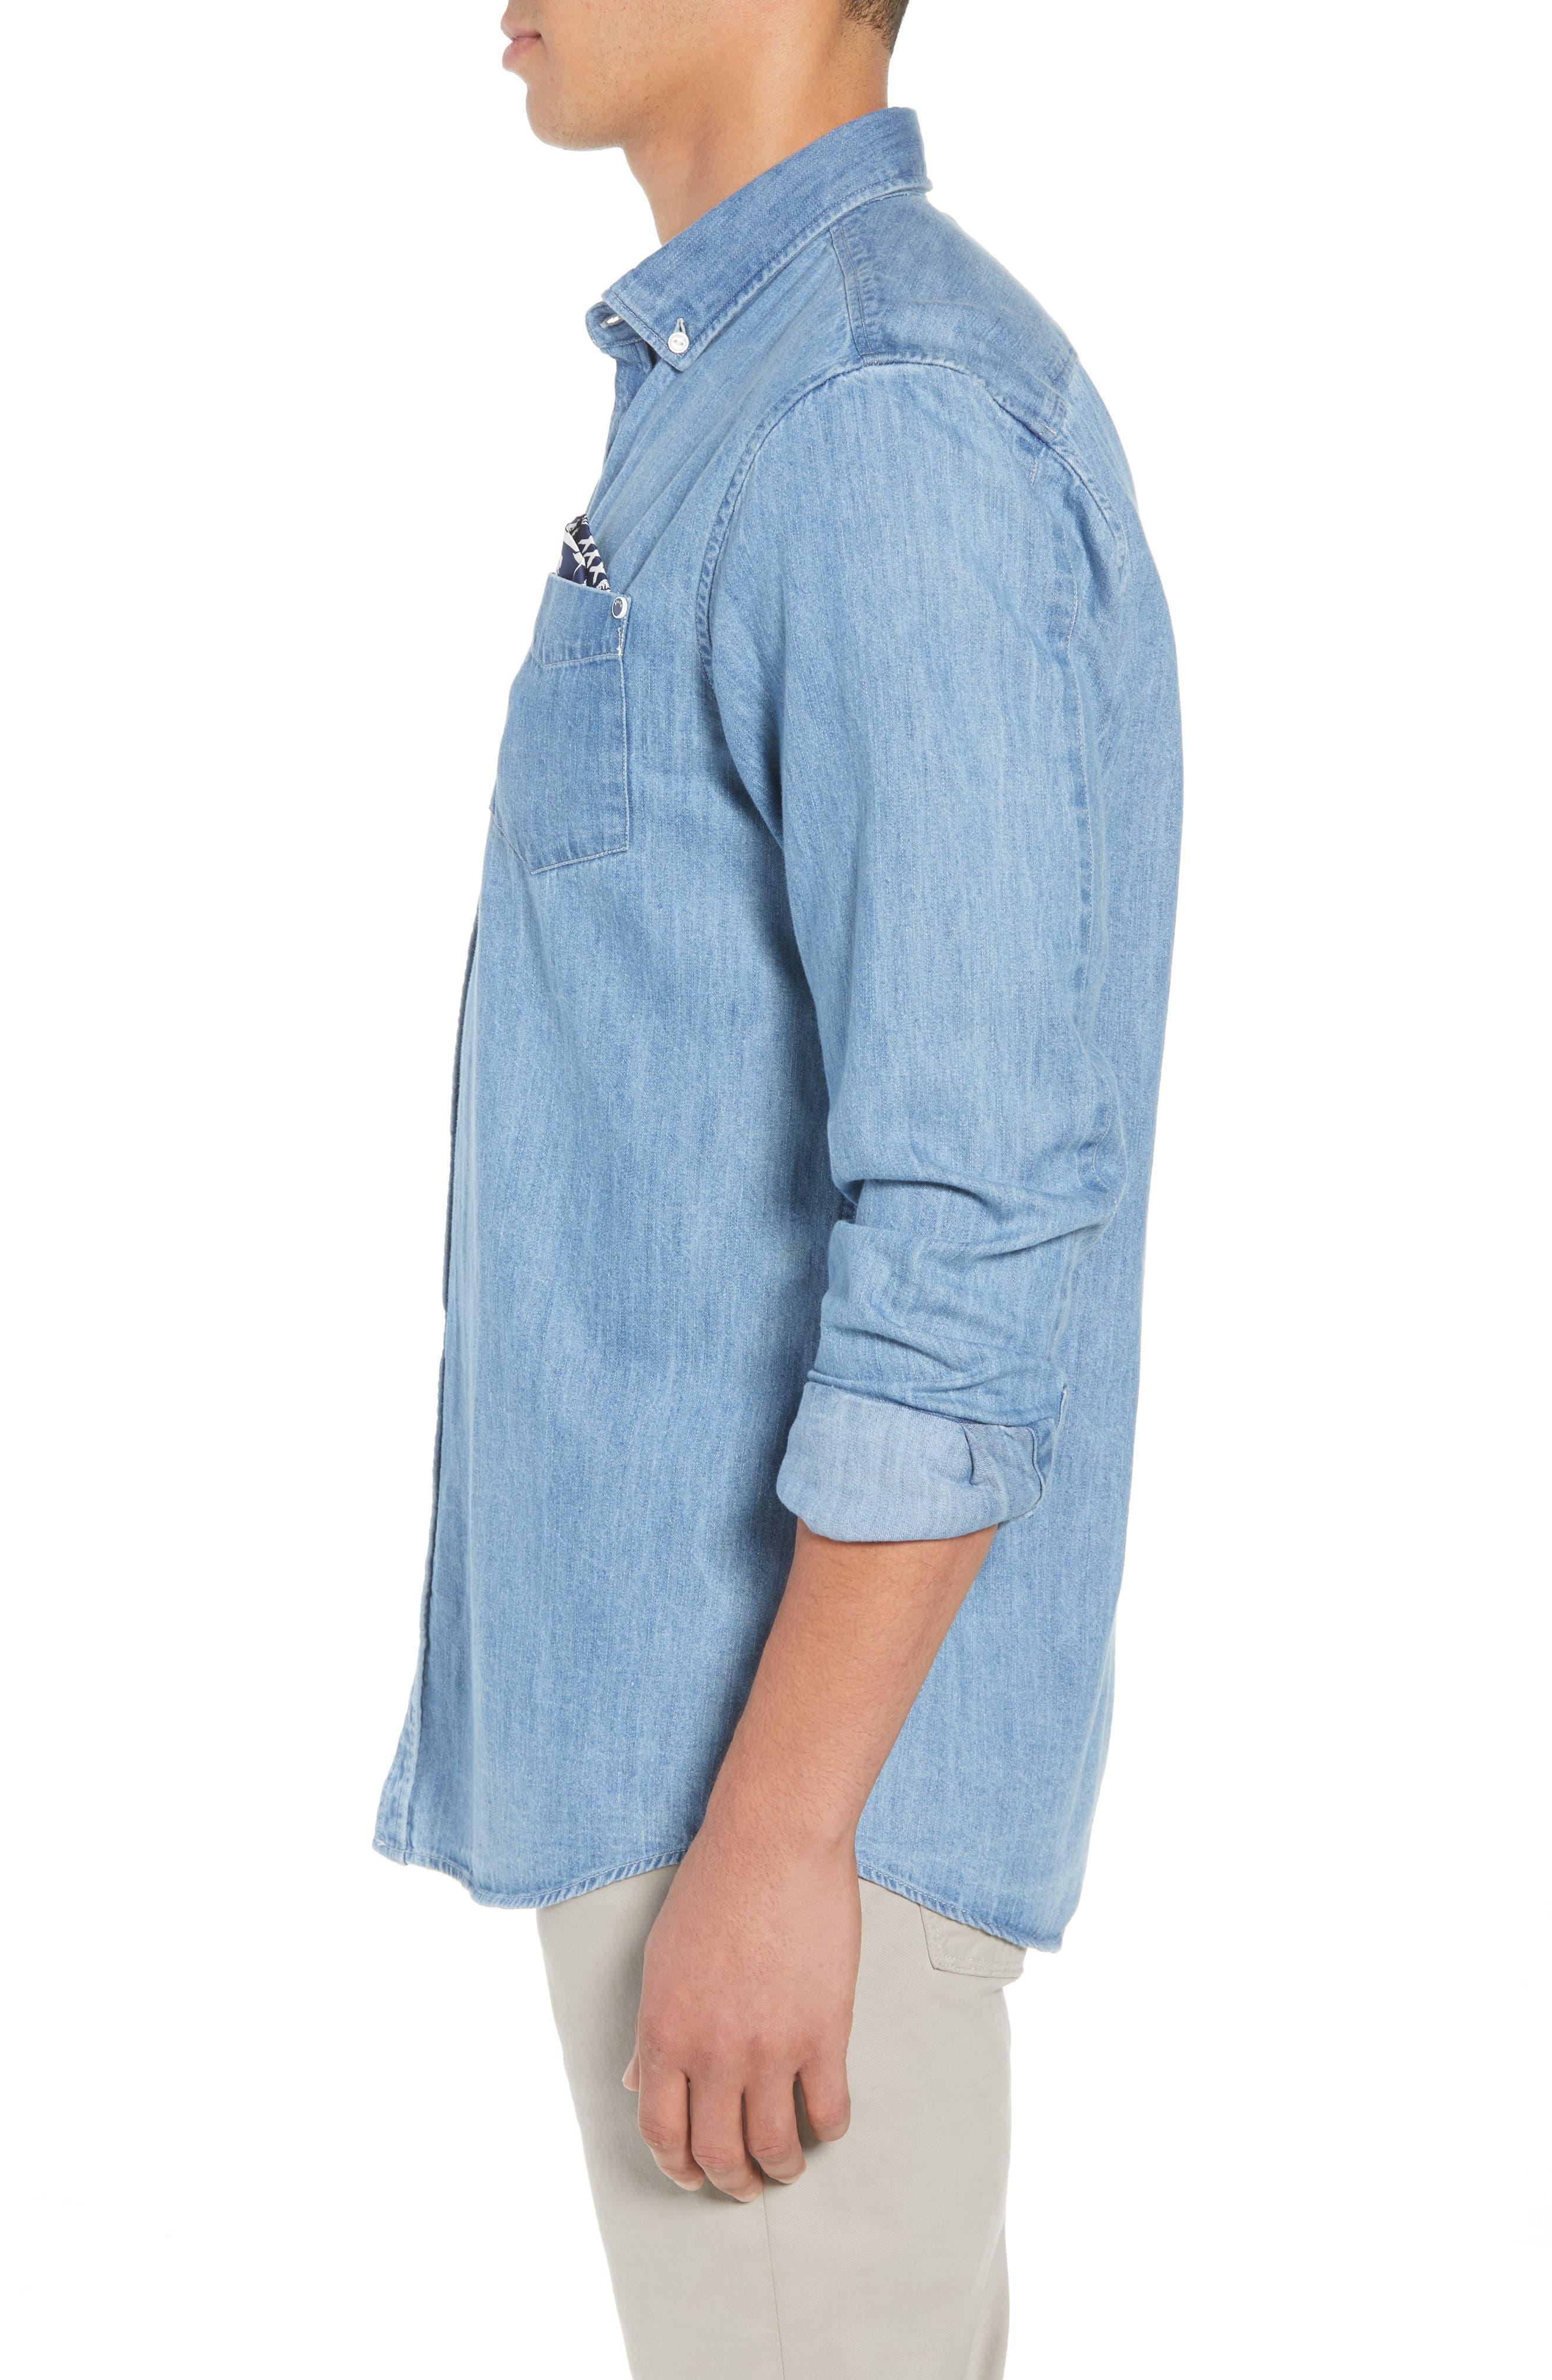 Amsterdams Blauw Pocket Square Chambray Sport Shirt,                             Alternate thumbnail 3, color,                             DENIM BLUE